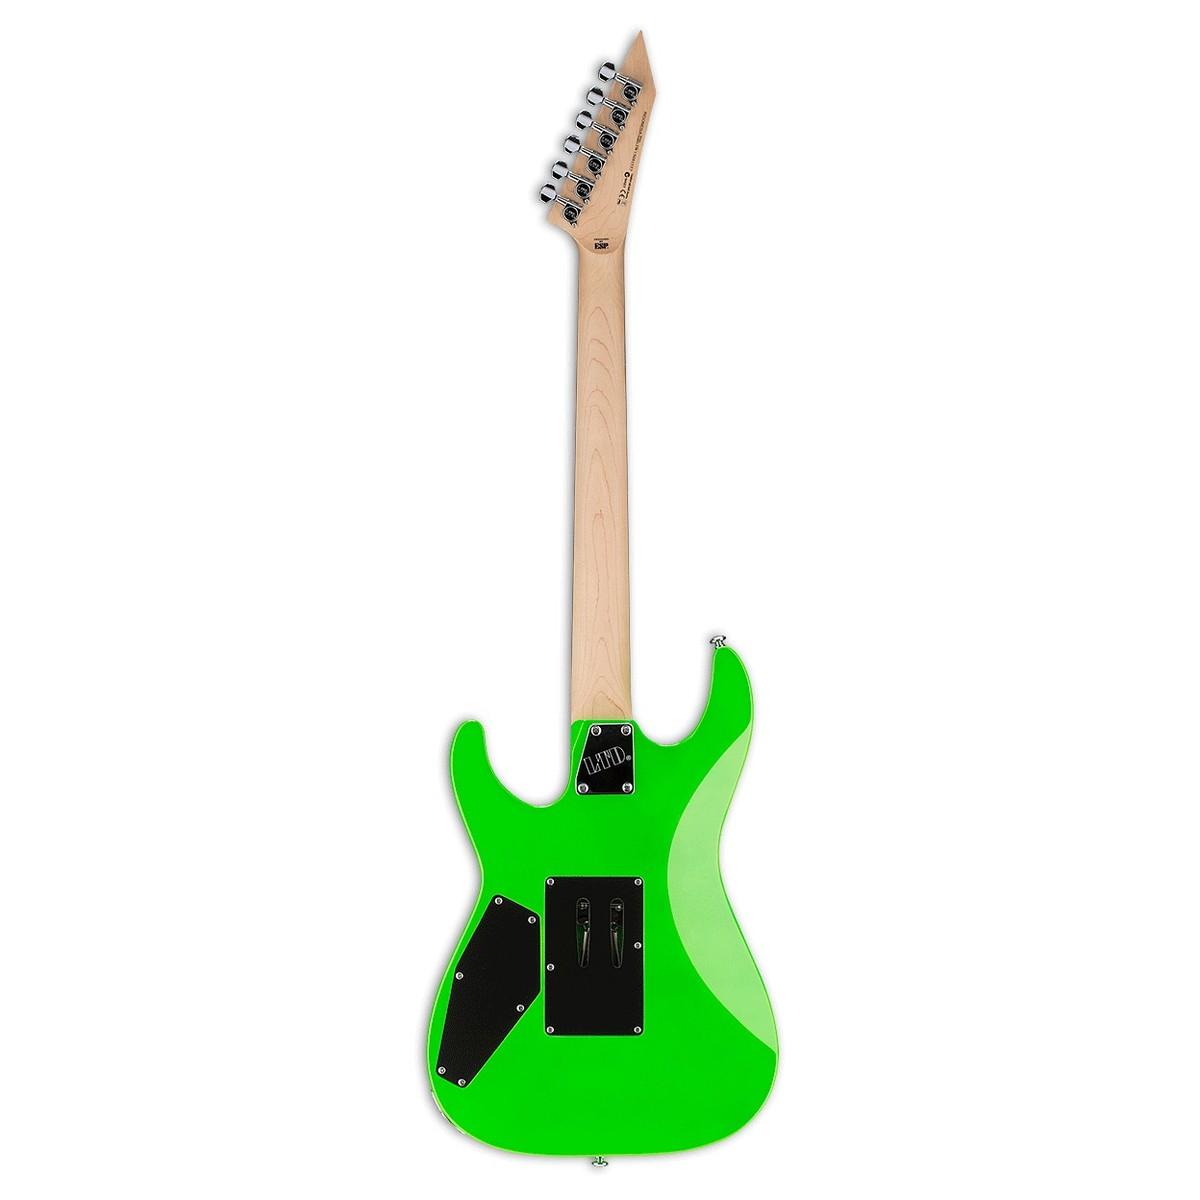 esp ltd m 50fr electric guitar neon green at gear4music. Black Bedroom Furniture Sets. Home Design Ideas